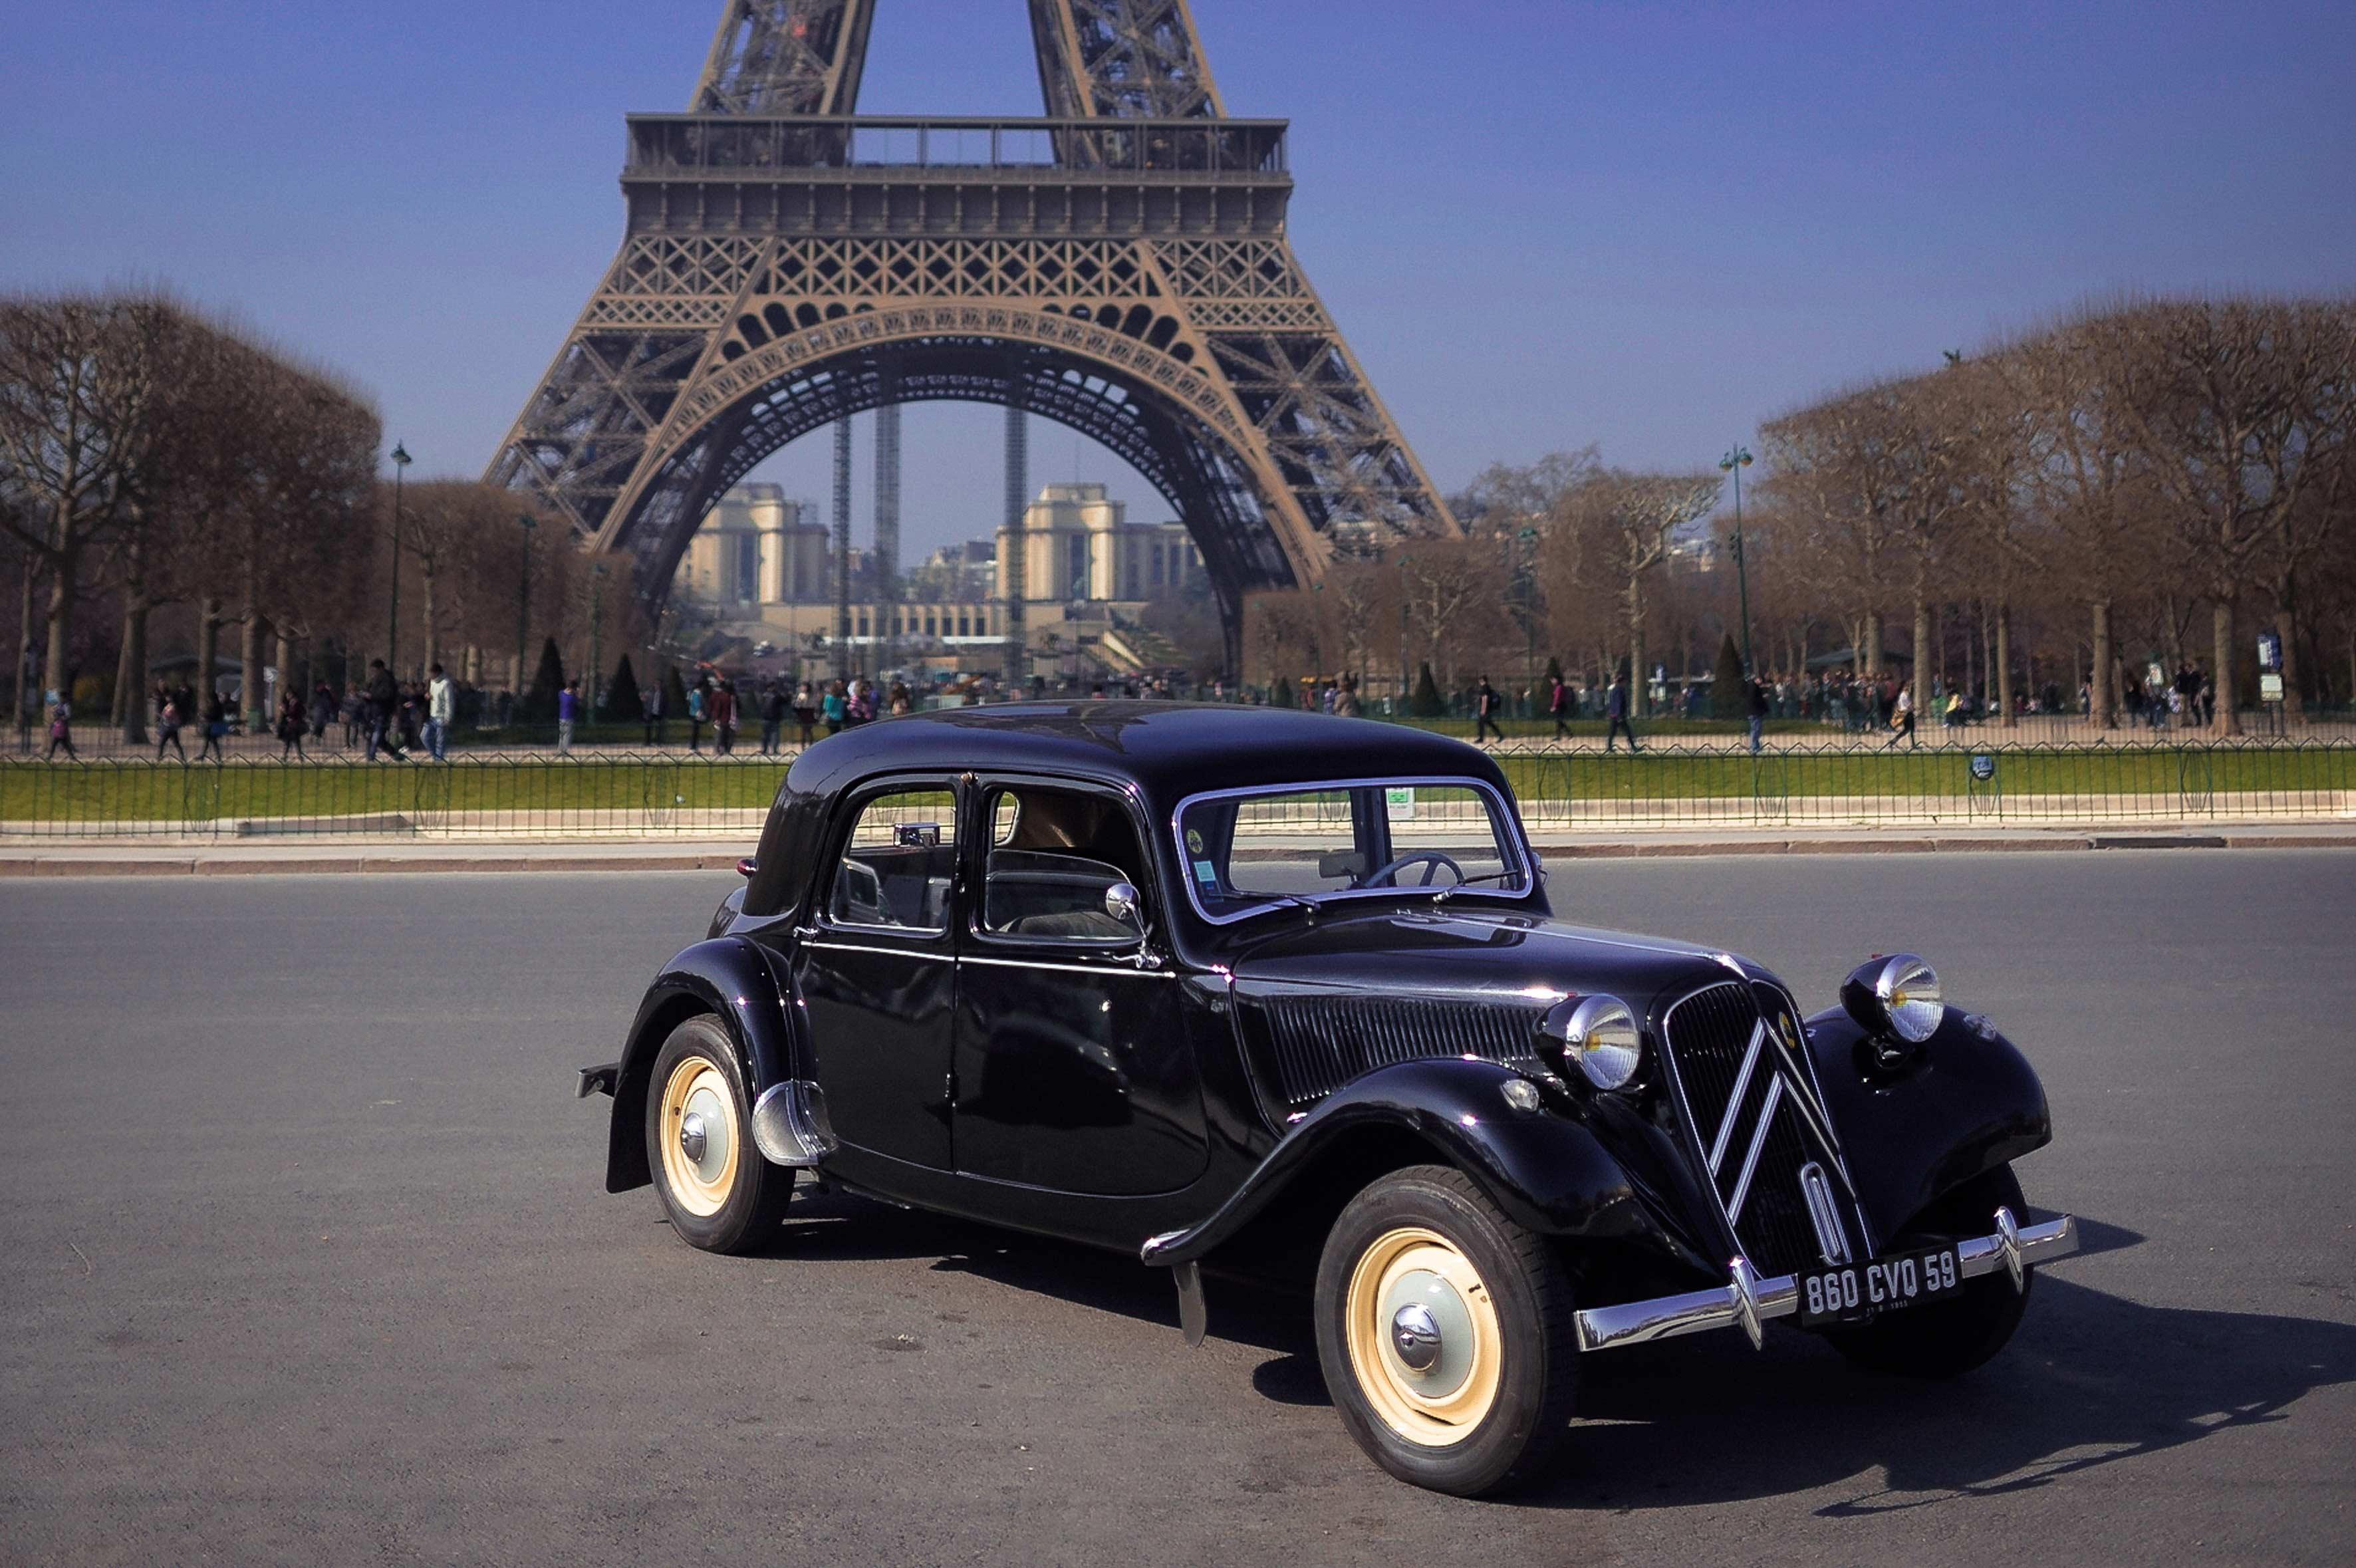 Free photo: Vintage Car - showroom, vintage, ride - Non-Commercial ...